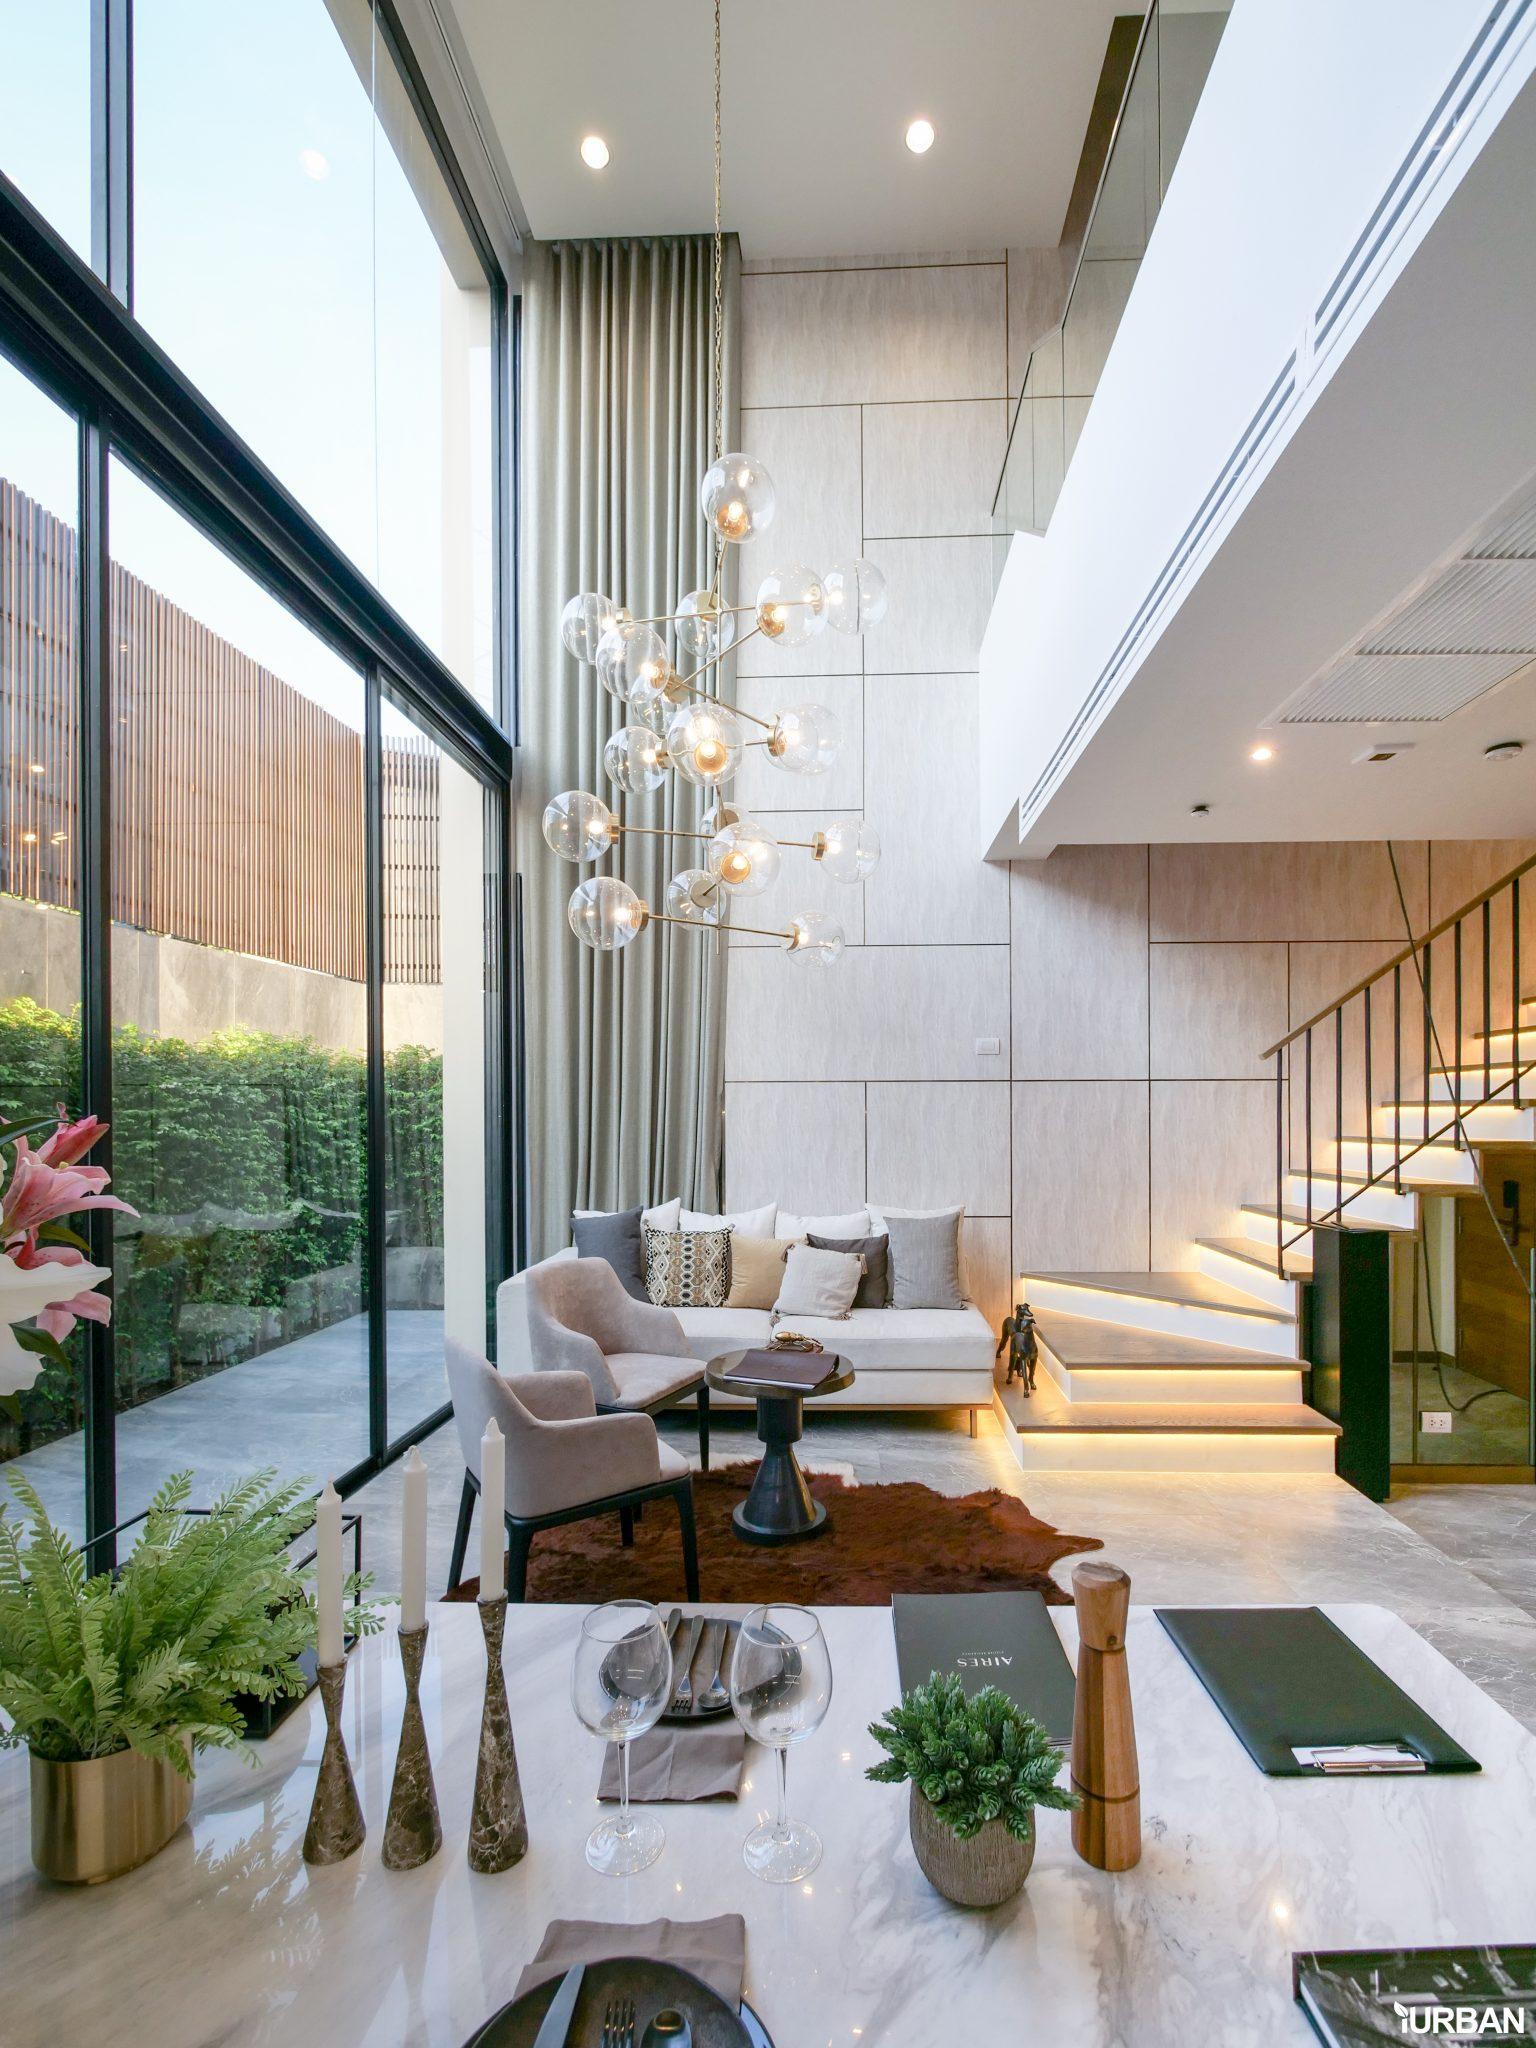 AIRES RAMA9 รีวิว Luxury Townhome 3.5 ชั้น + Rooftop ออกแบบสวย ย่านพระราม9 (ใกล้ รพ.สมิติเวช) 24 - AIRES